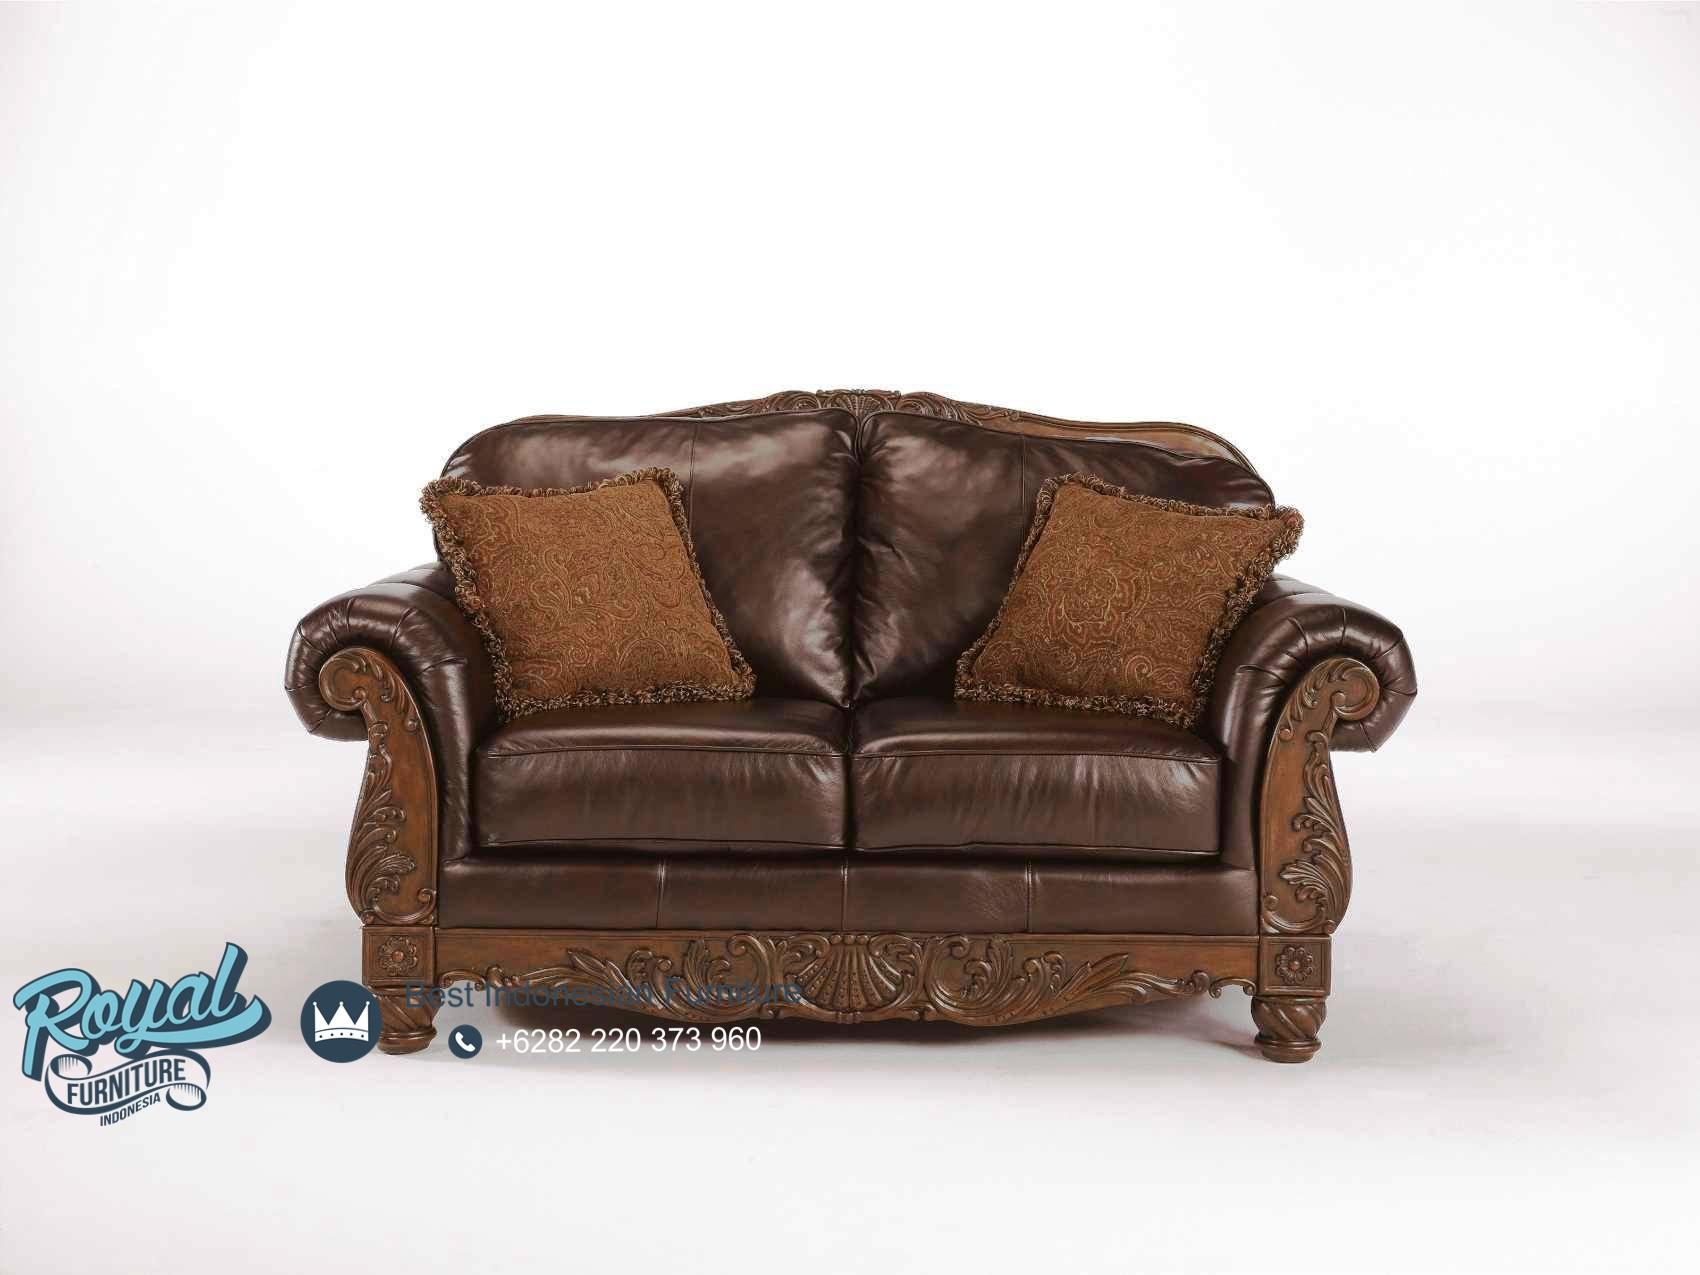 Kursi Sofa Tamu Klasik Ukiran Jepara Kayu Jati Antique, sofa tamu mewah jepara, sofa tamu mewah kayu jati, sofa tamu mewah terbaru, sofa tamu mewah kayu jati, jual sofa tamu mewah asli jepara, sofa ruang tamu mewah, sofa ruang tamu mewah modern, kursi sofa tamu mewah, harga sofa tamu mewah murah, sofa tamu minimalis mewah, sofa mewah, kursi tamu mewah modern, kursi tamu mewah minimalis, sofa mewah modern, kursi mewah ruang tamu, kursi tamu mewah kualitas terbaik, sofa klasik mewah terbaru, mebel jepara, furniture jepara, royal furniture